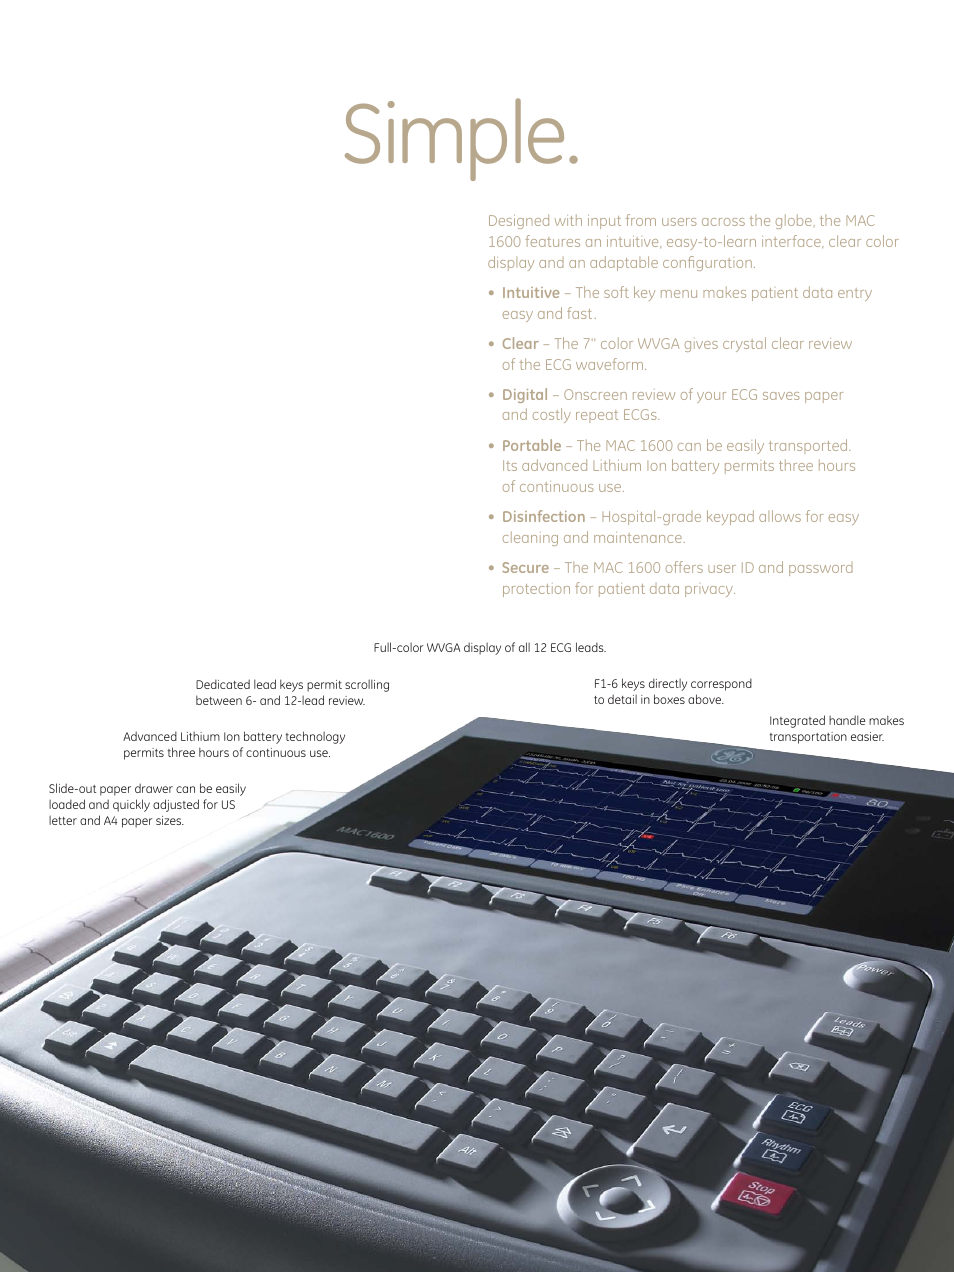 simple ge healthcare mac 1600 ecg user manual page 3 8 rh manualsdir com ge mac 1600 service manual GE EKG